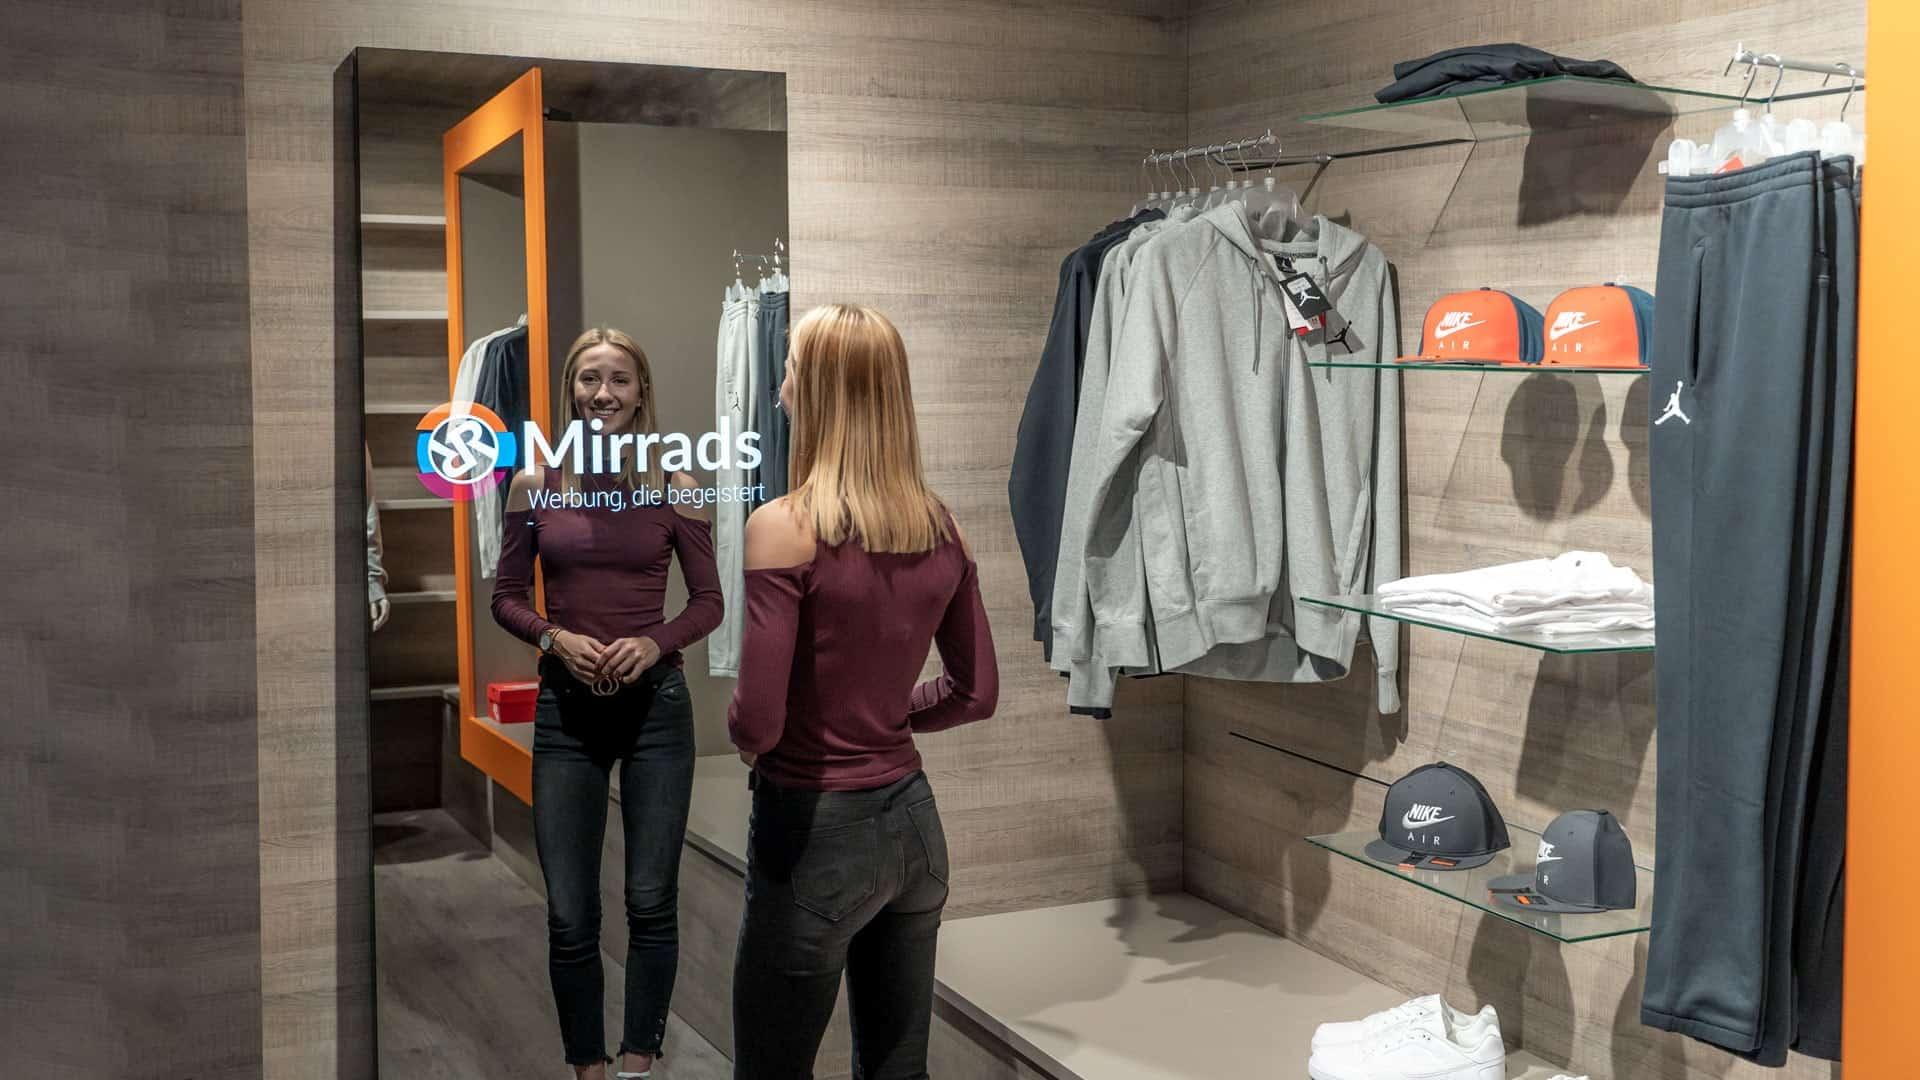 Smart Mirror Digital Signage